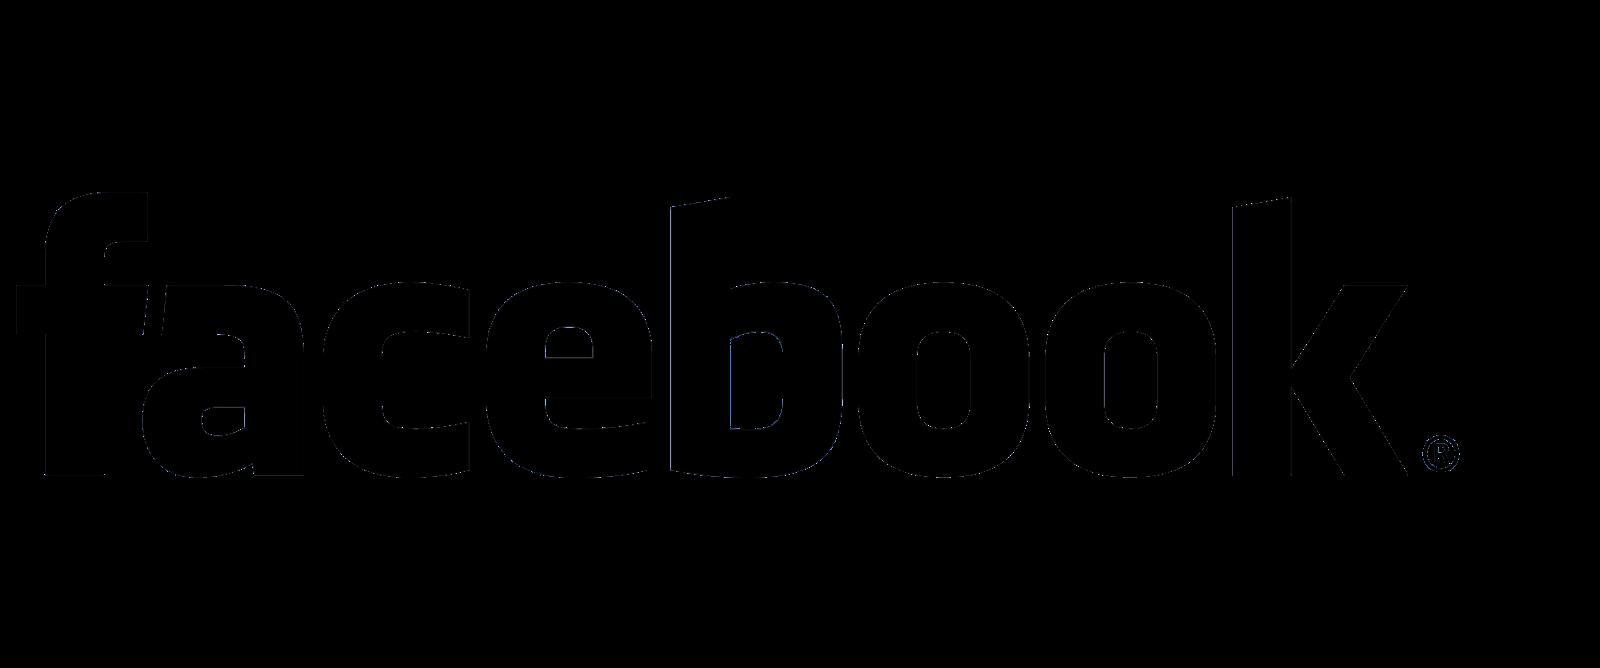 Kumpulan Status FB Lucu Terbaru Welcome To Chaltea